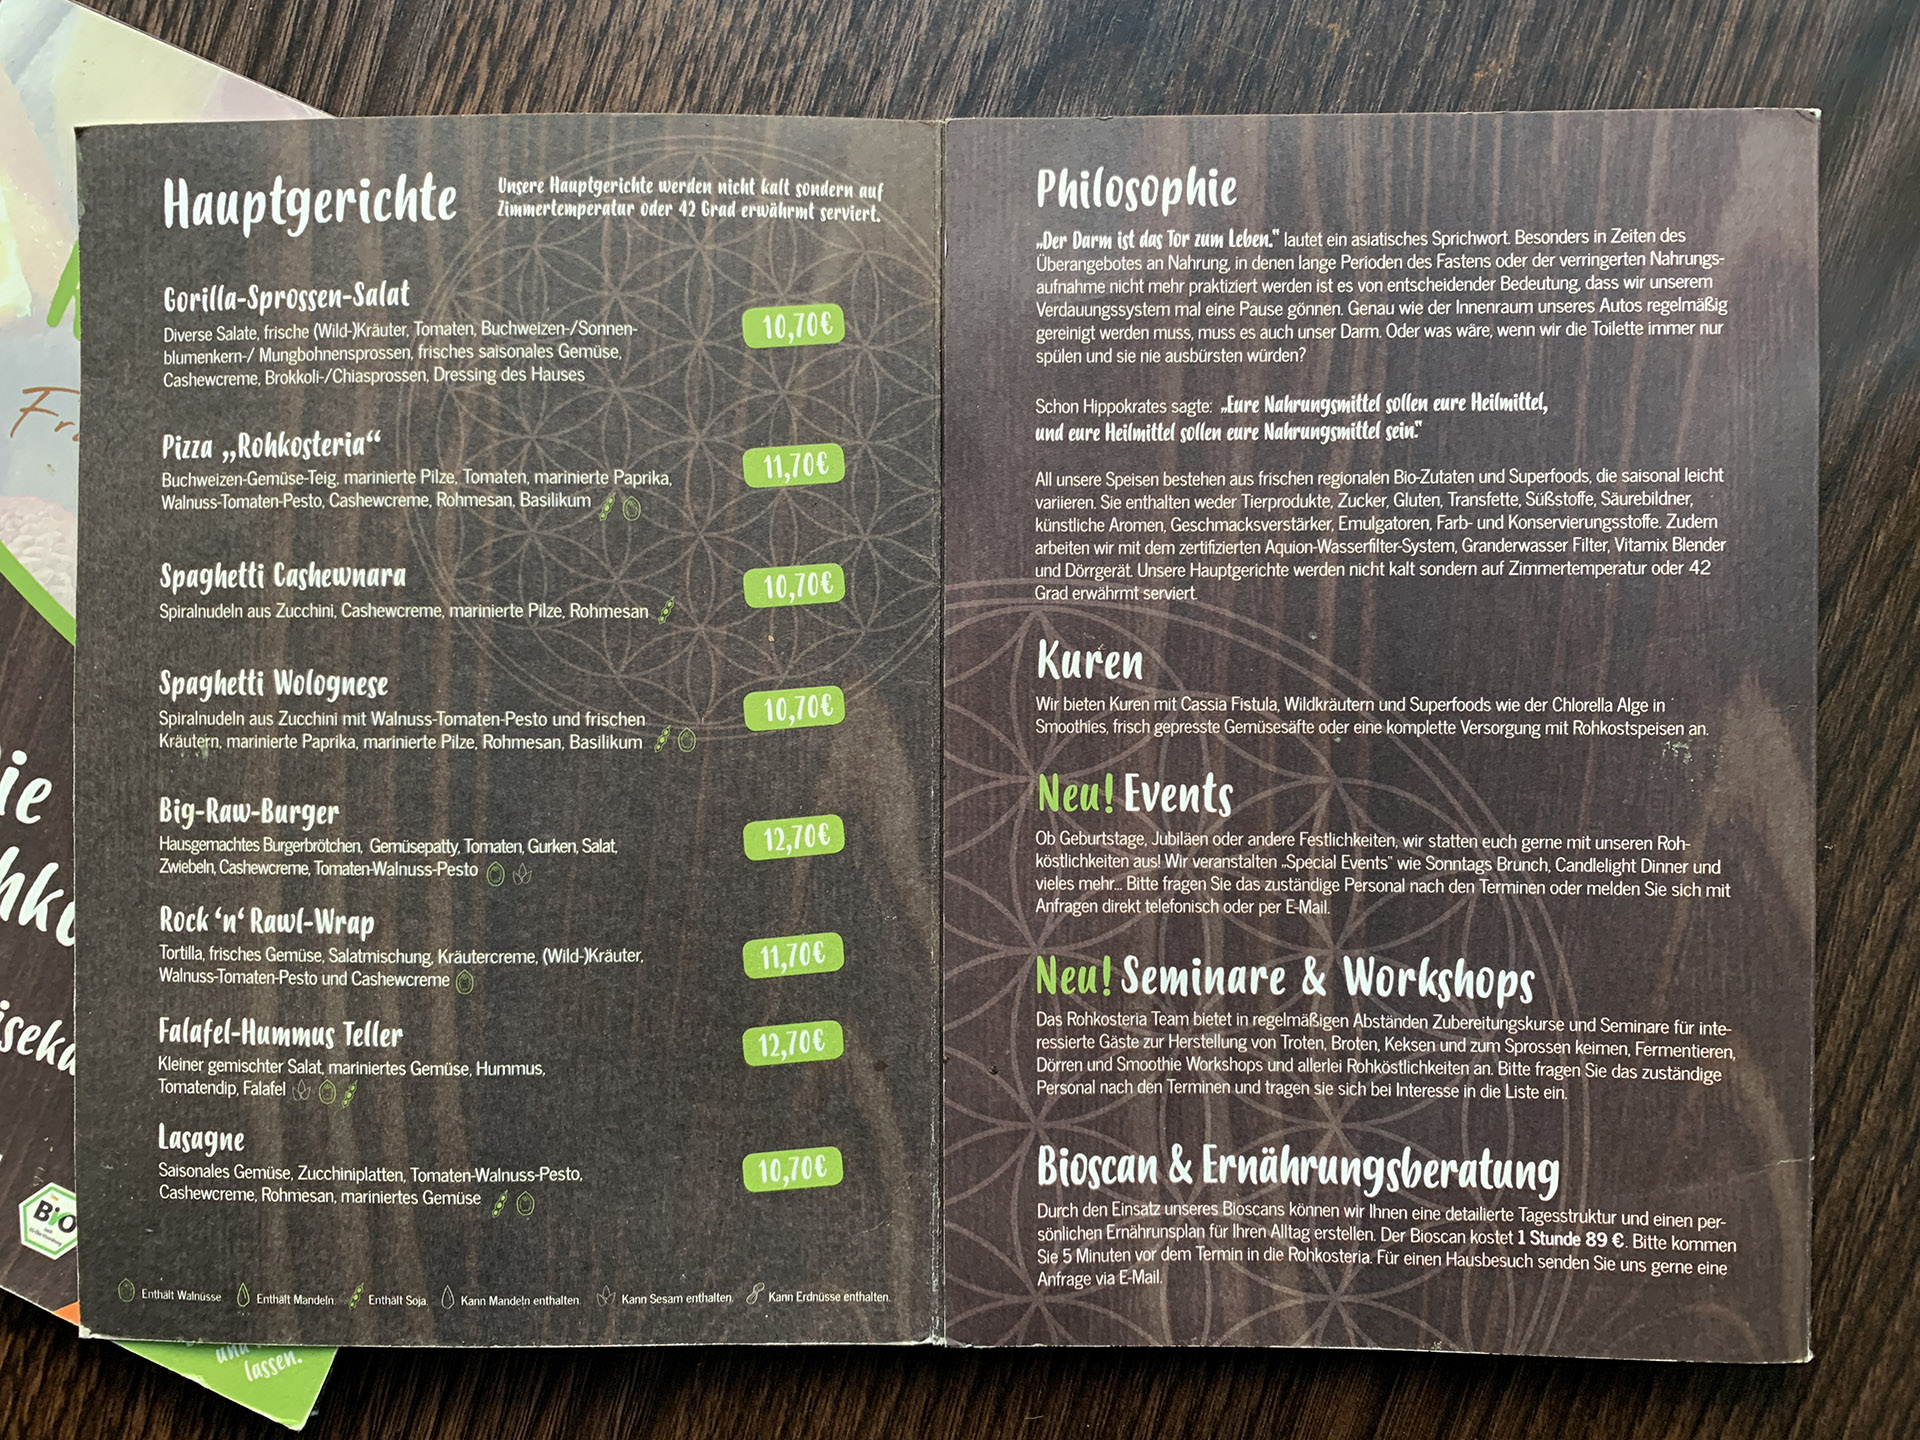 rohkosteria frankfurt karte restaurant rohkost